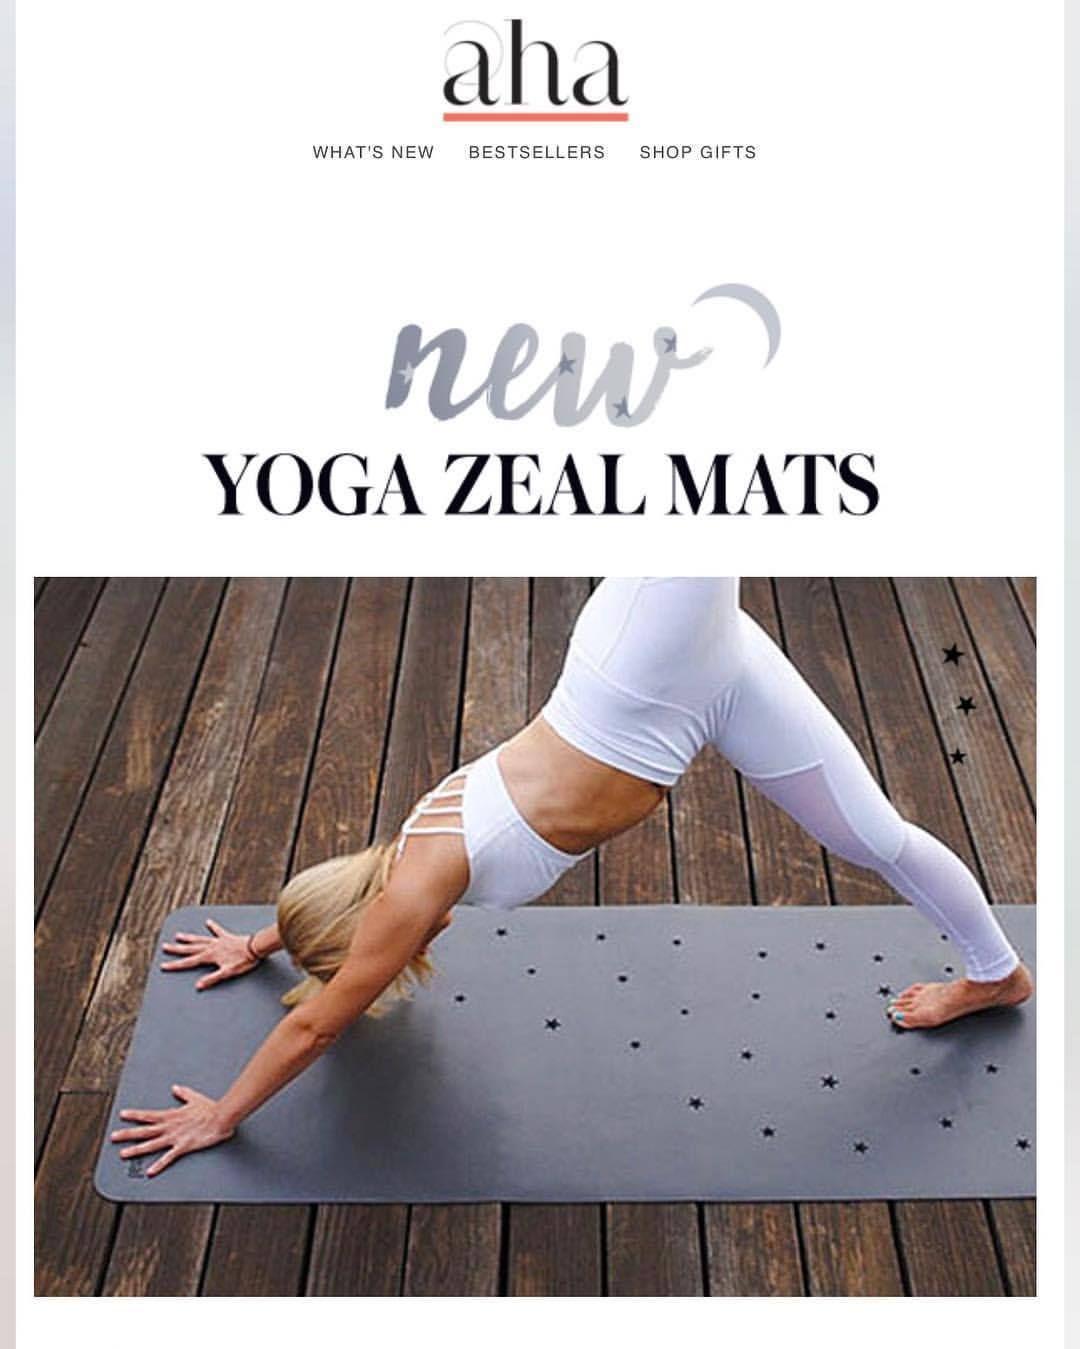 35++ Sweaty hands slipping on yoga mat ideas in 2021